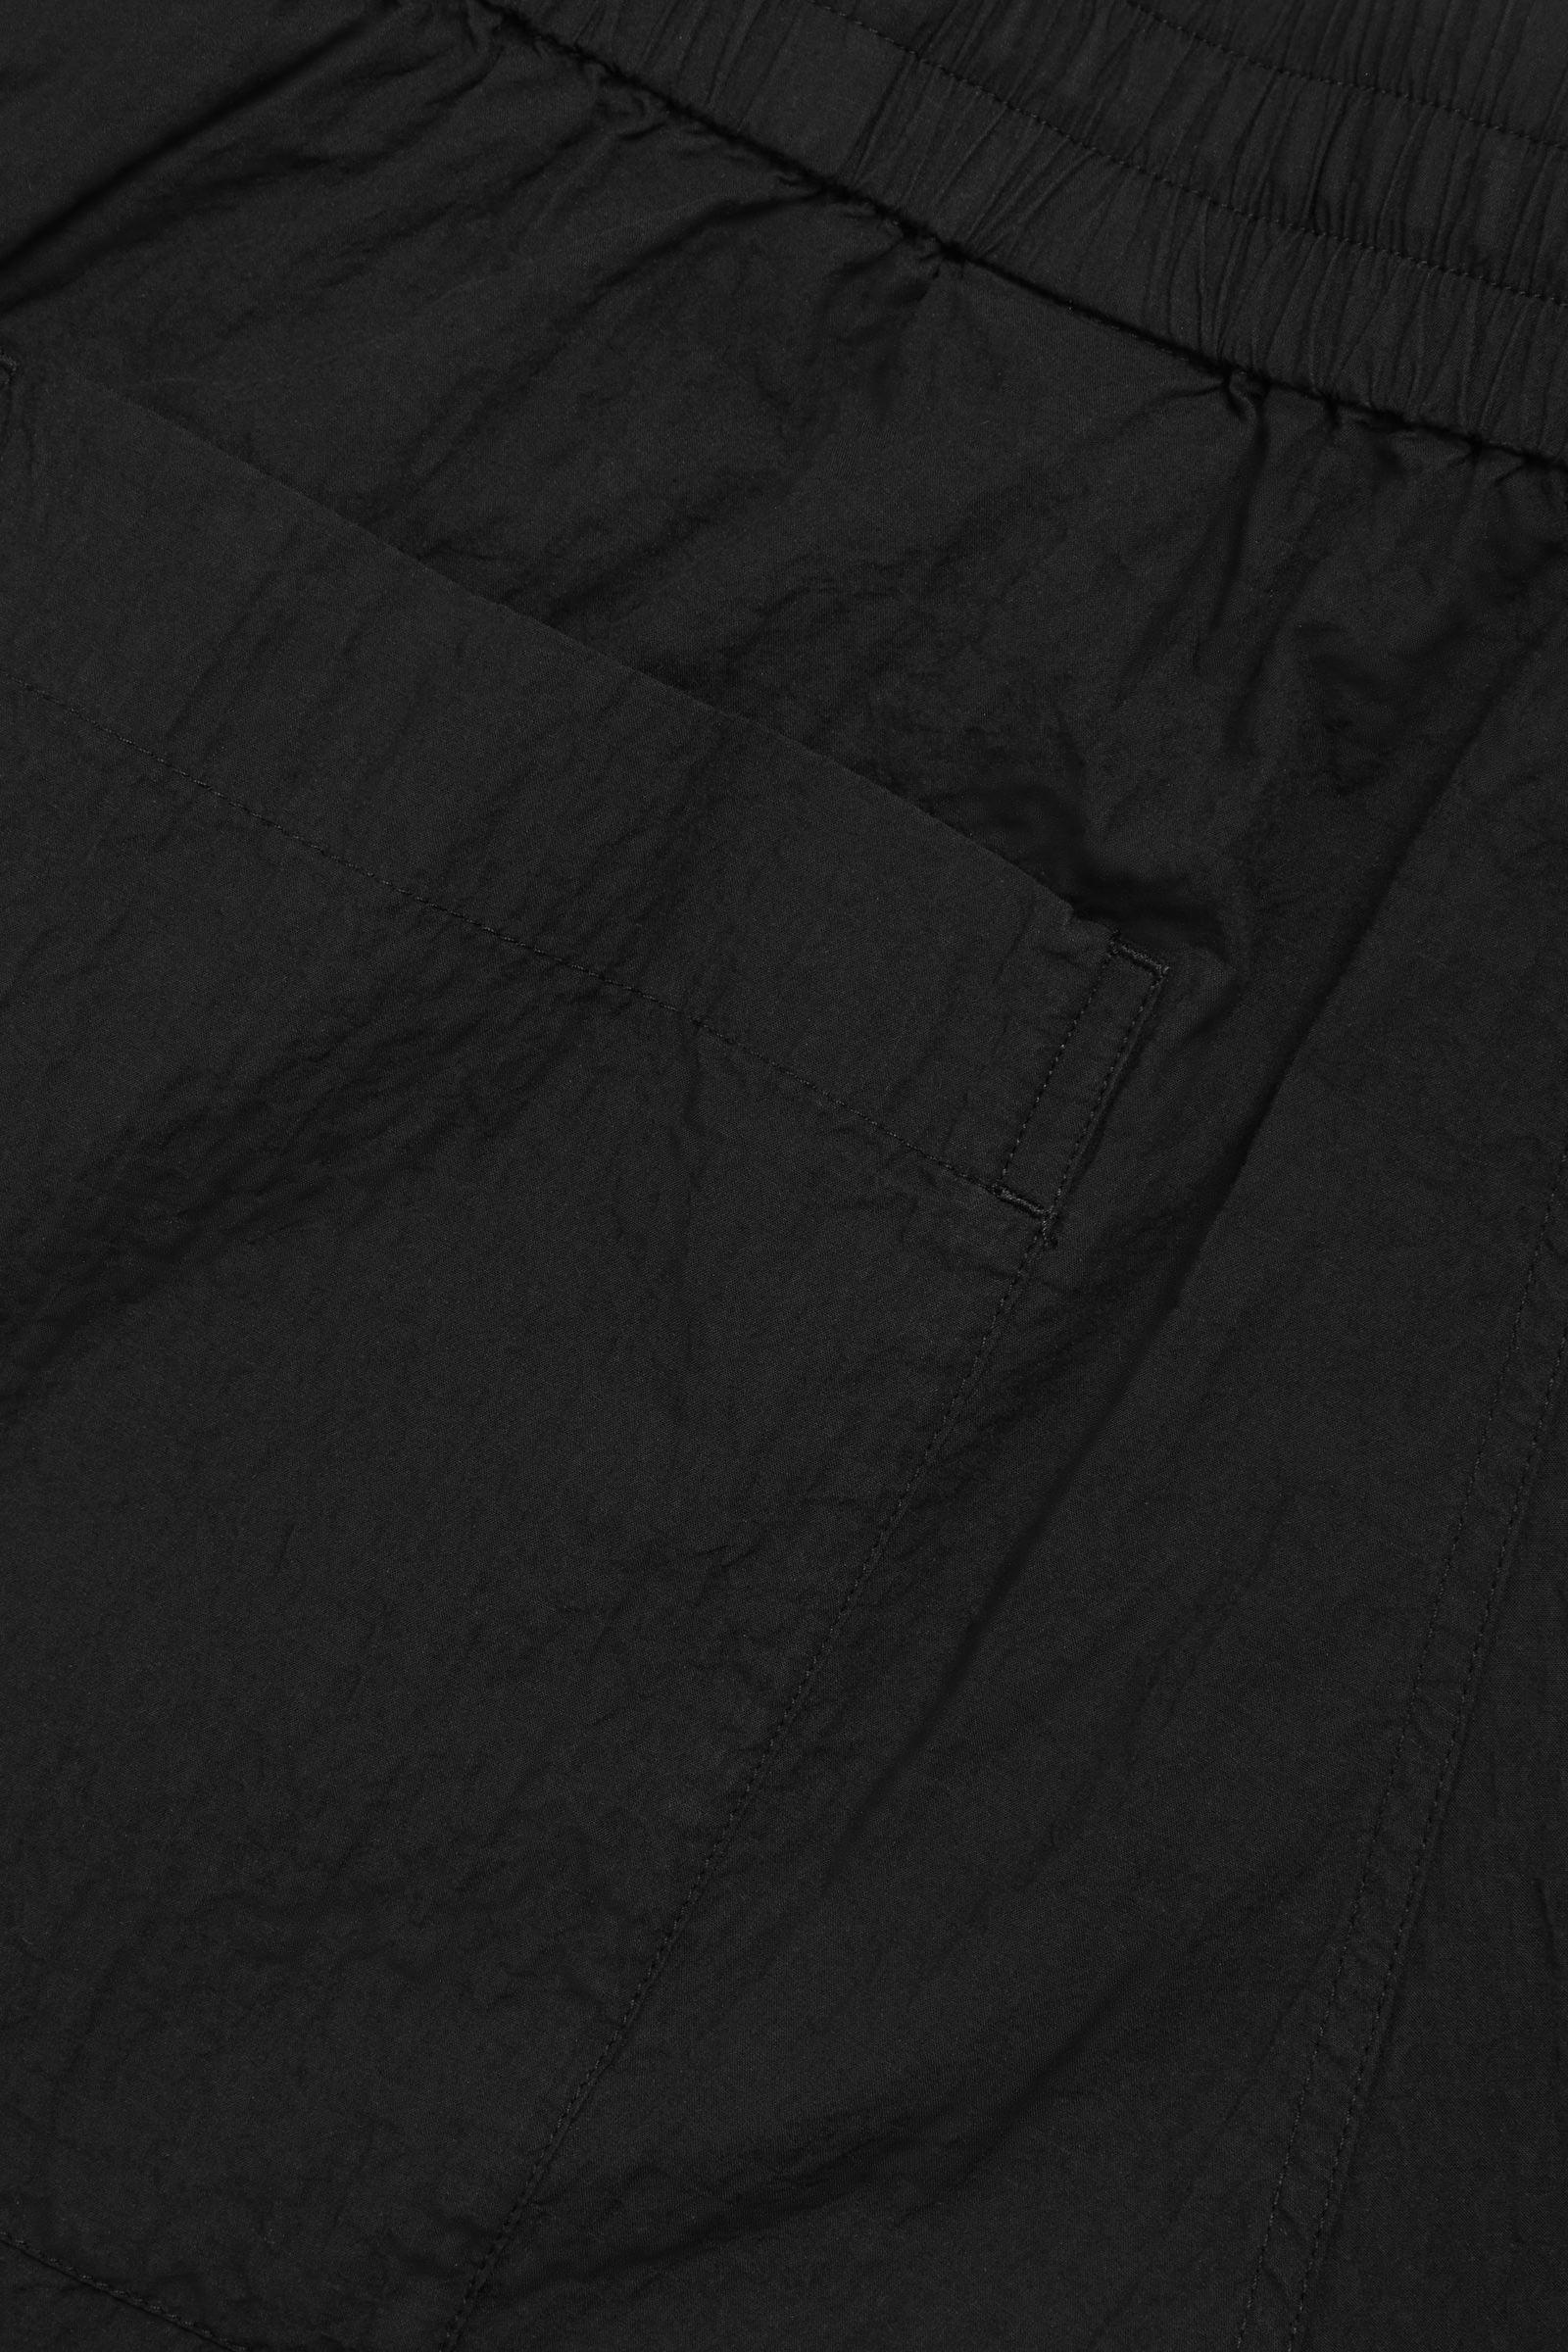 COS 시어서커 코튼 쇼츠의 블랙컬러 Detail입니다.